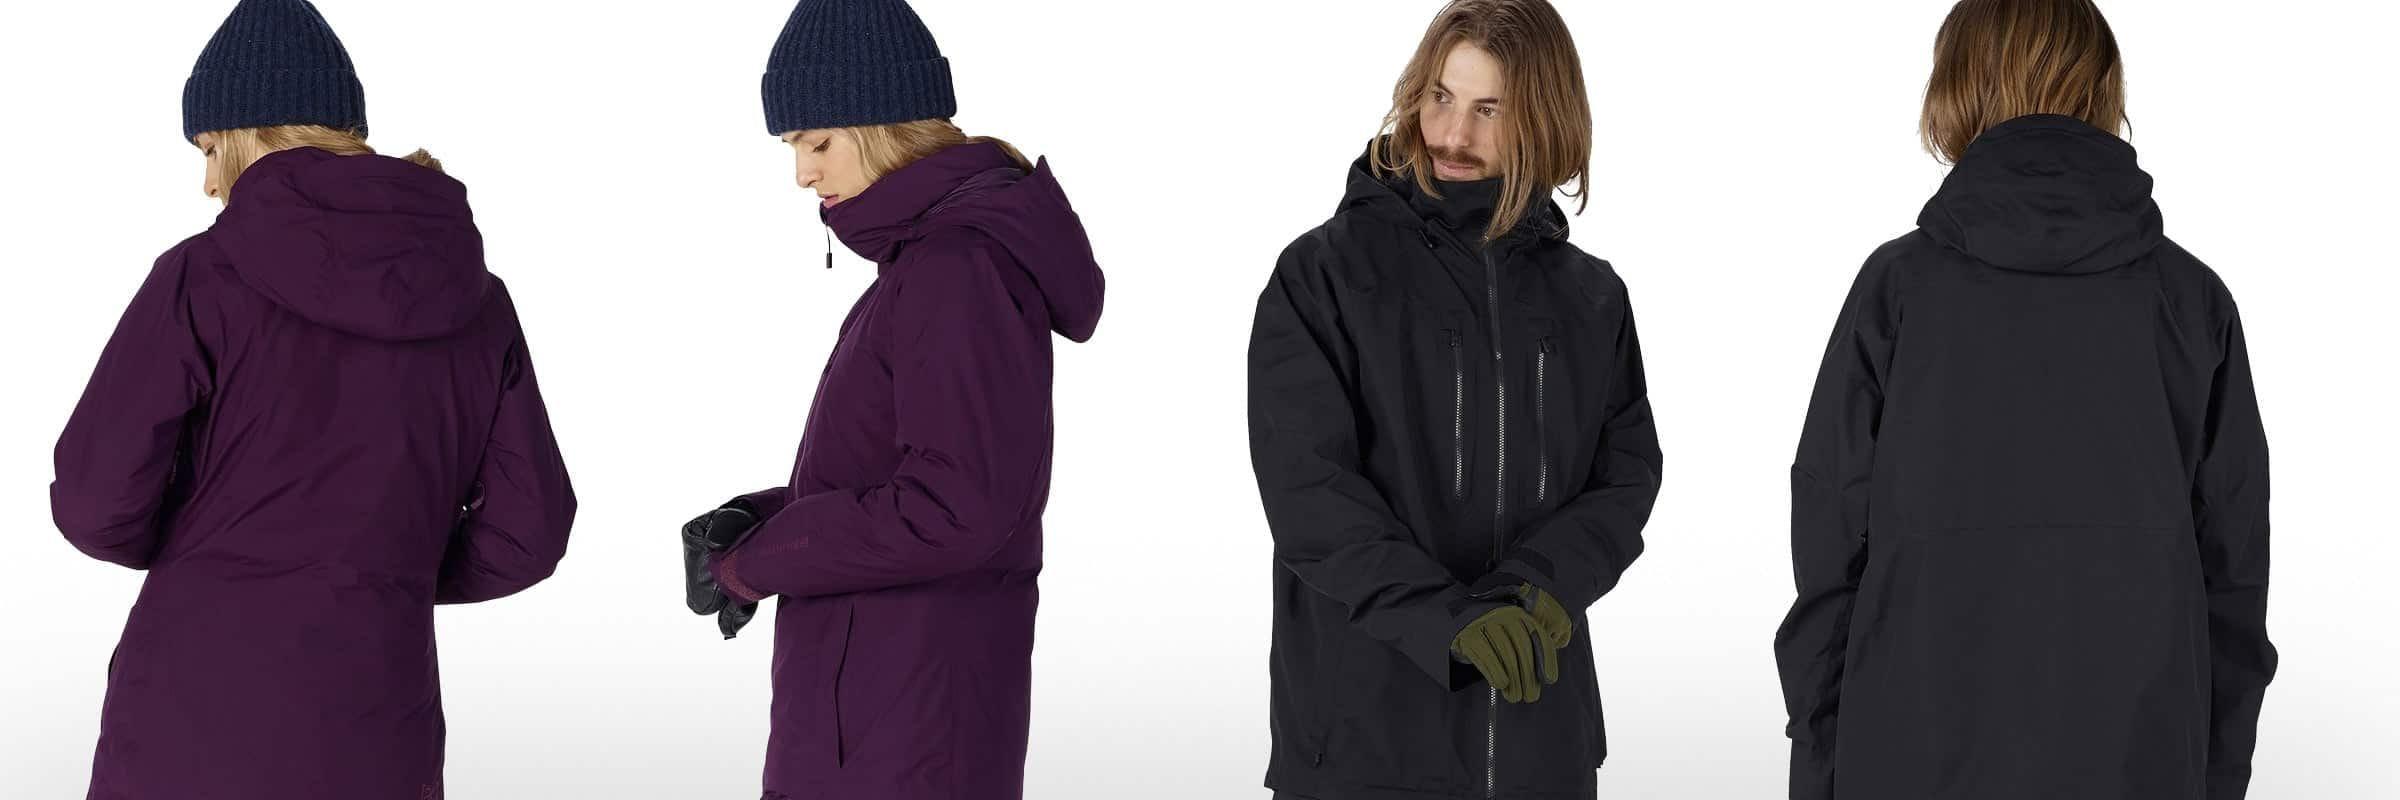 burton bluesign jackets